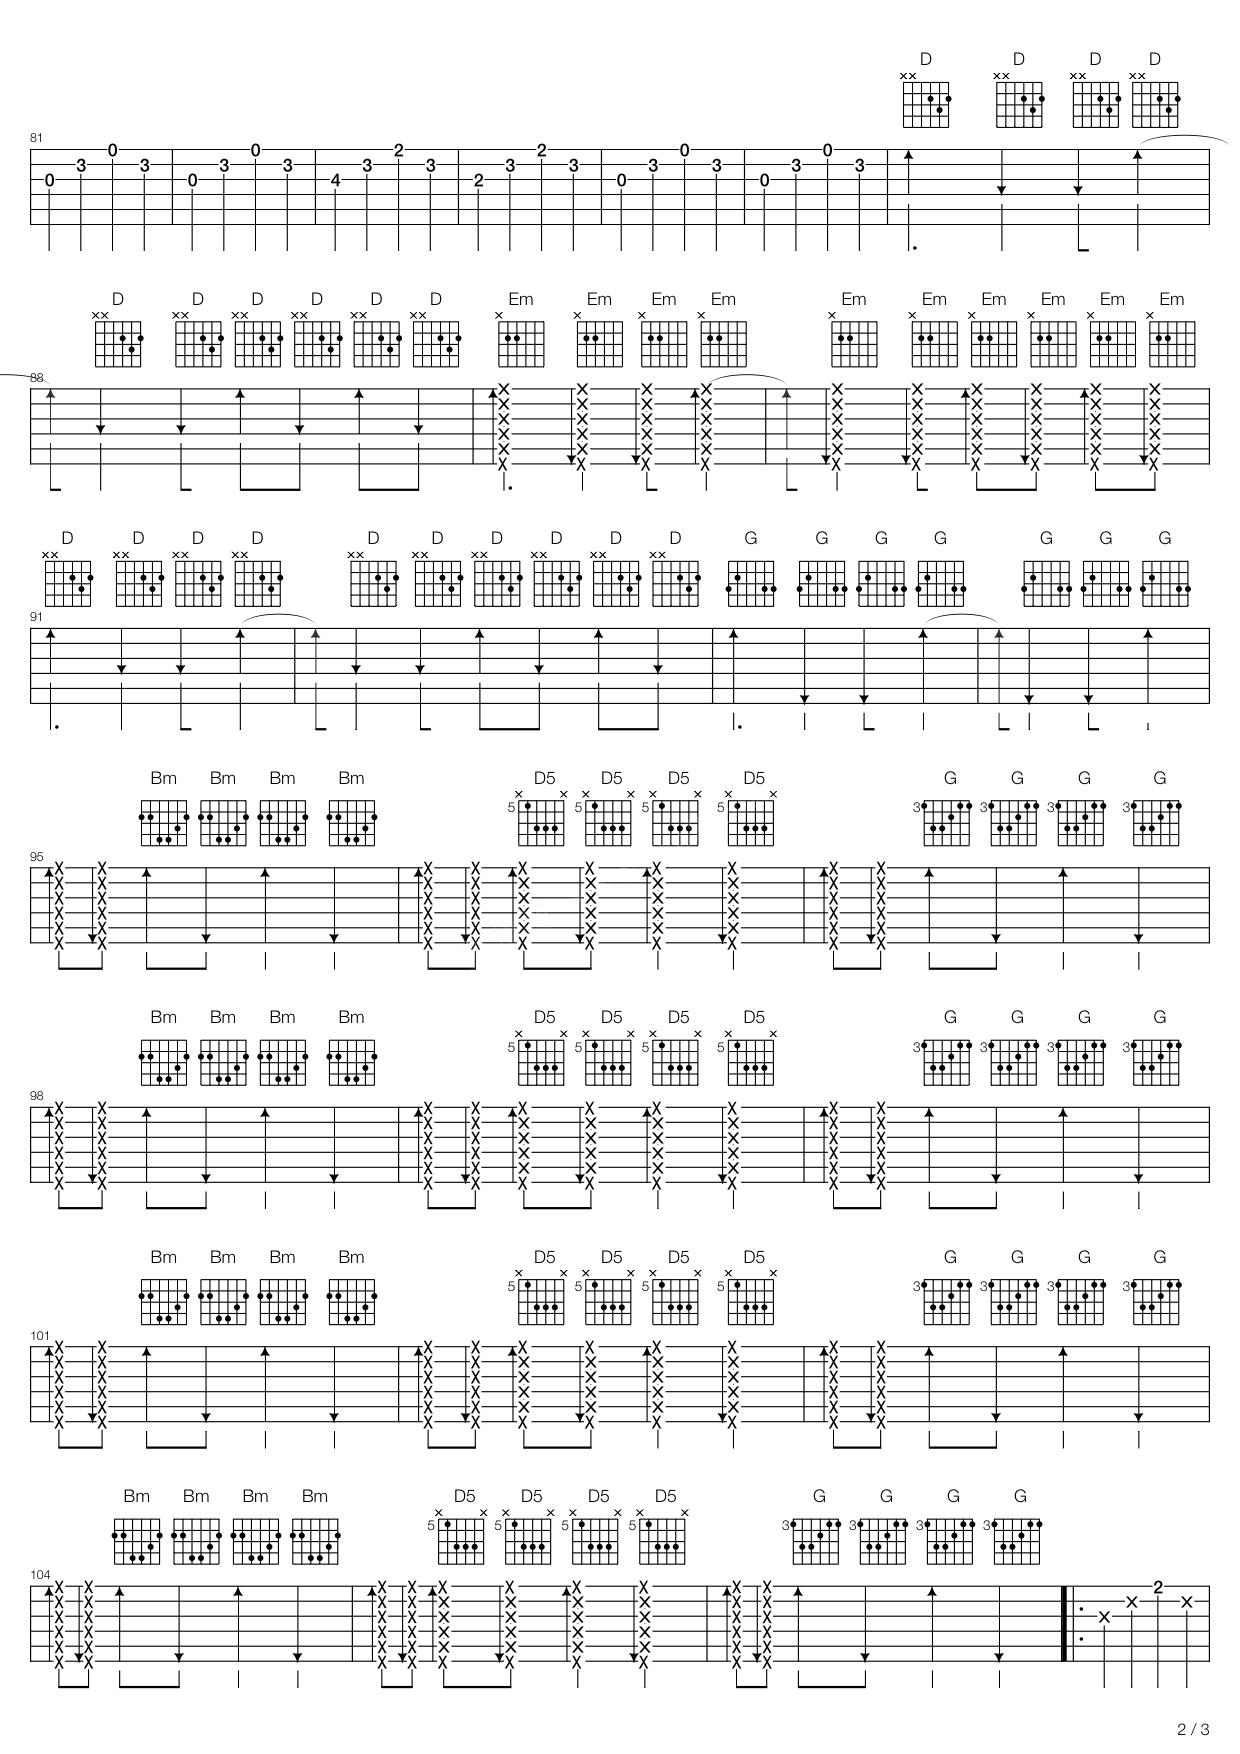 Sunday Bloody Sunday吉他谱 U2-彼岸吉他 - 一站式吉他爱好者服务平台